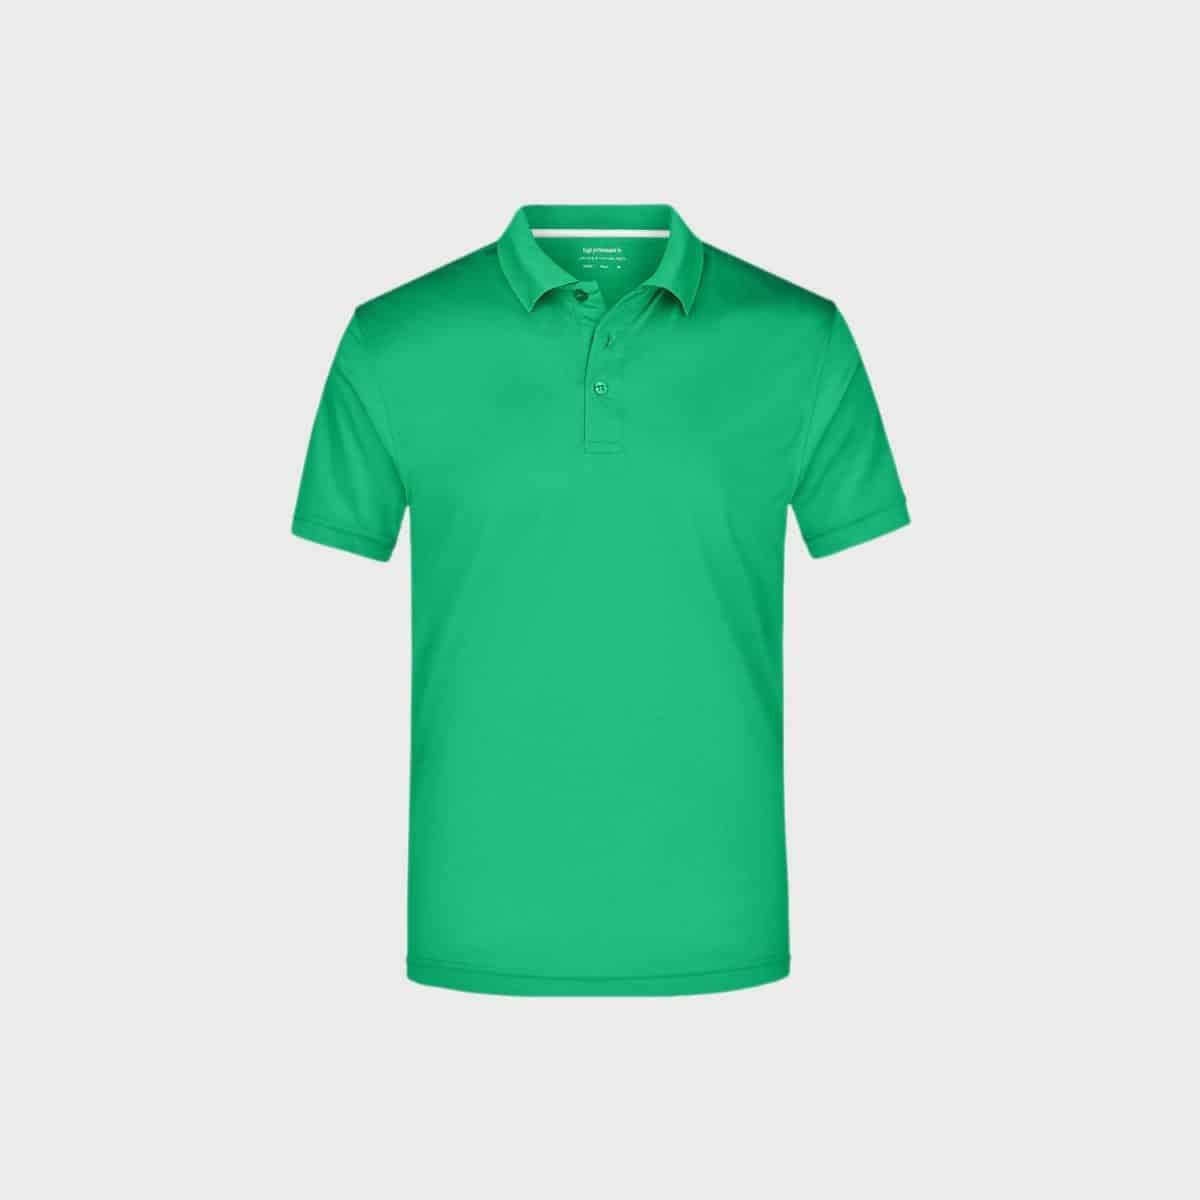 Daiber SportShirts JN401 Frog Front